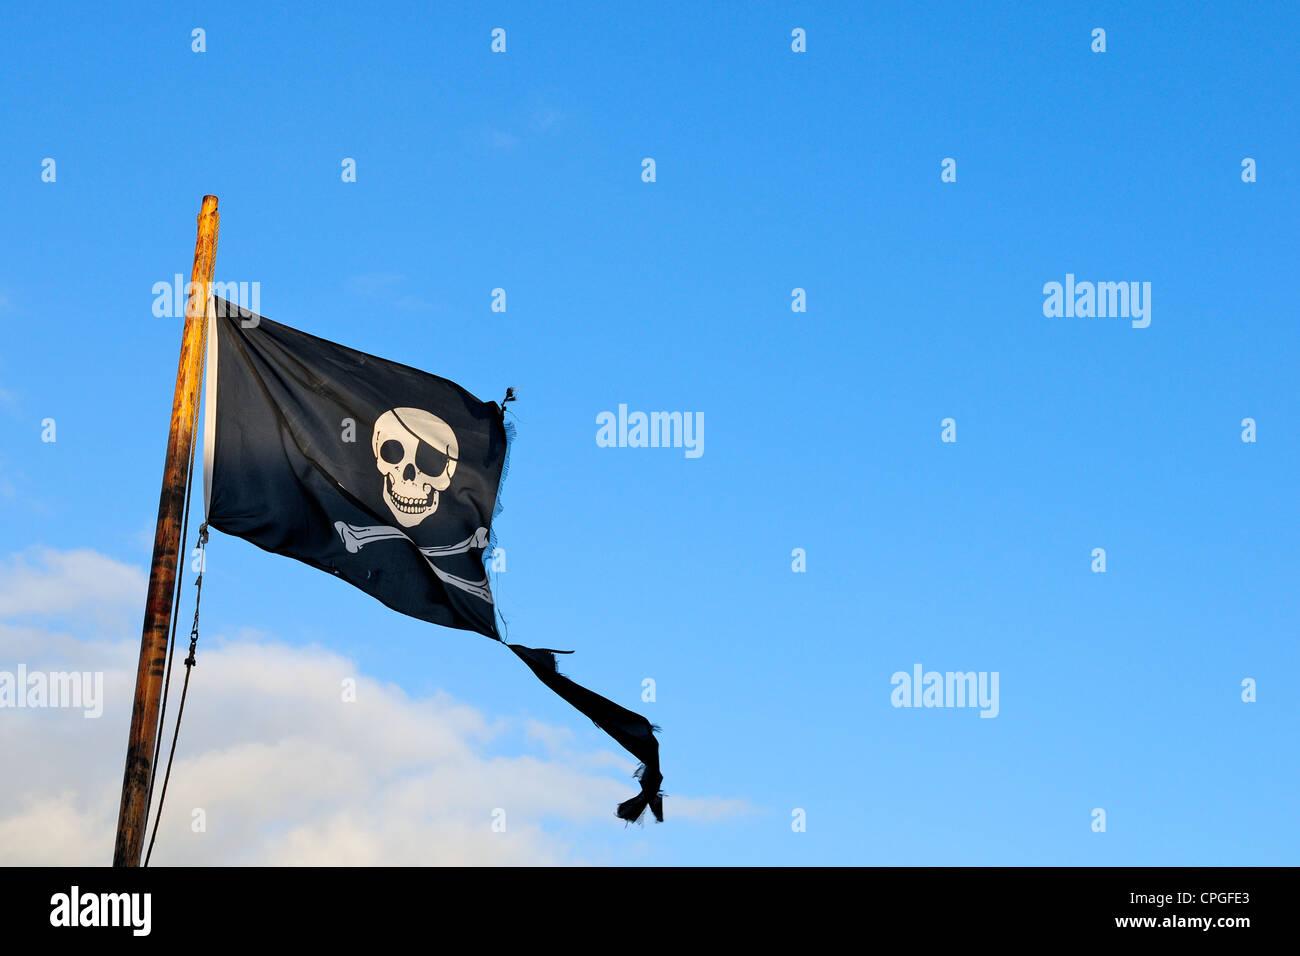 Jolly Roger / skull and crossbones pirate flag - Stock Image